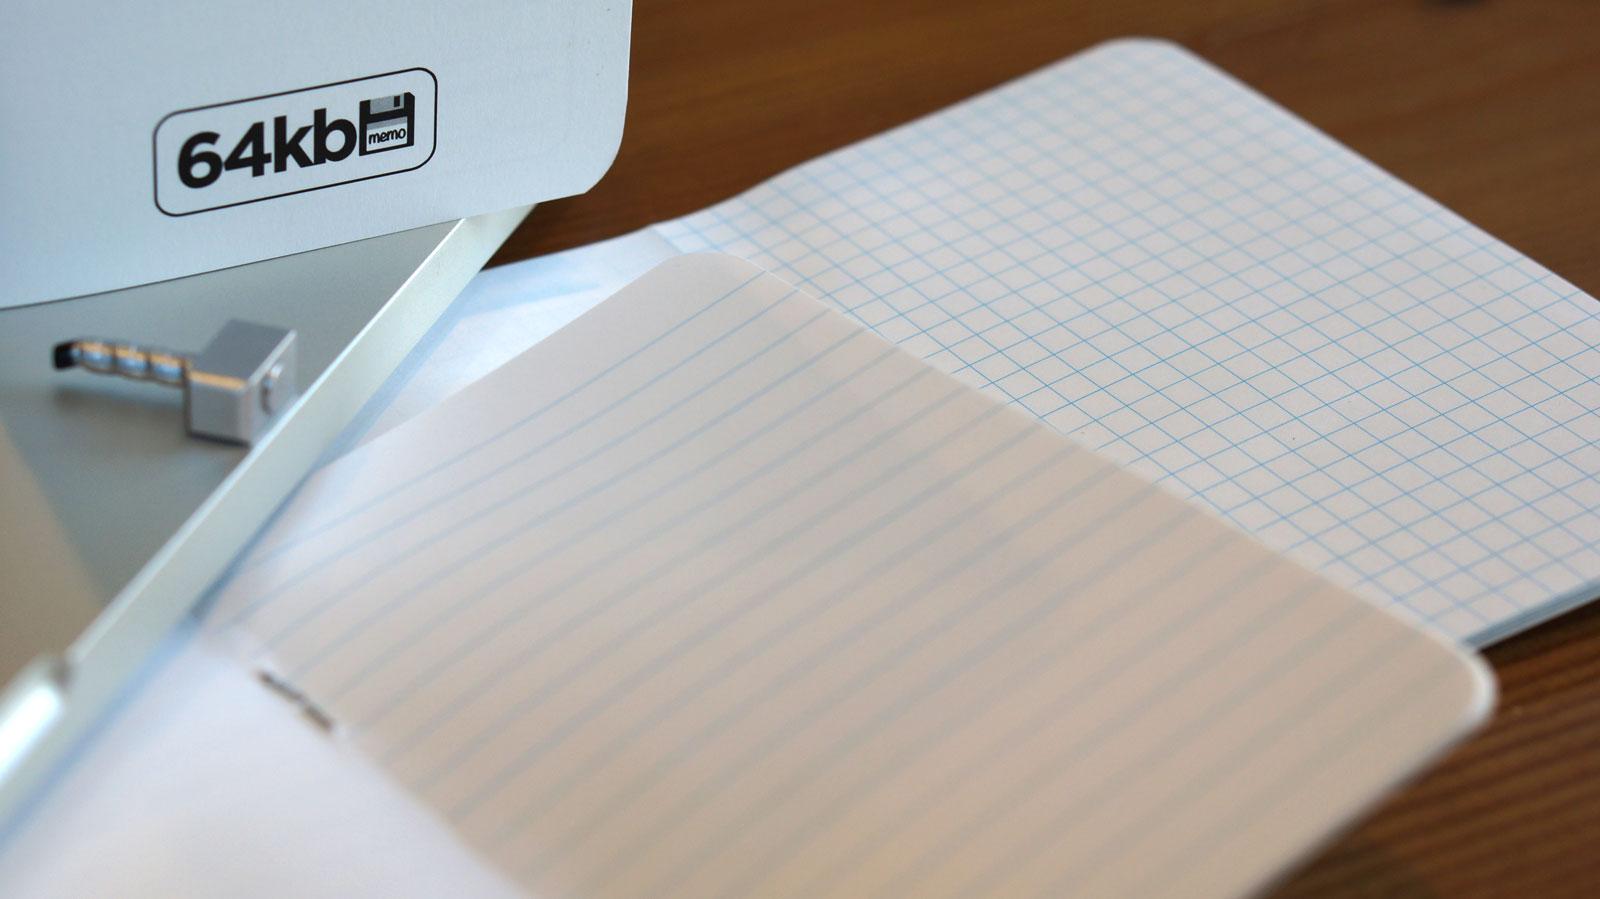 Hybrid book: Half-blank, half-ruled